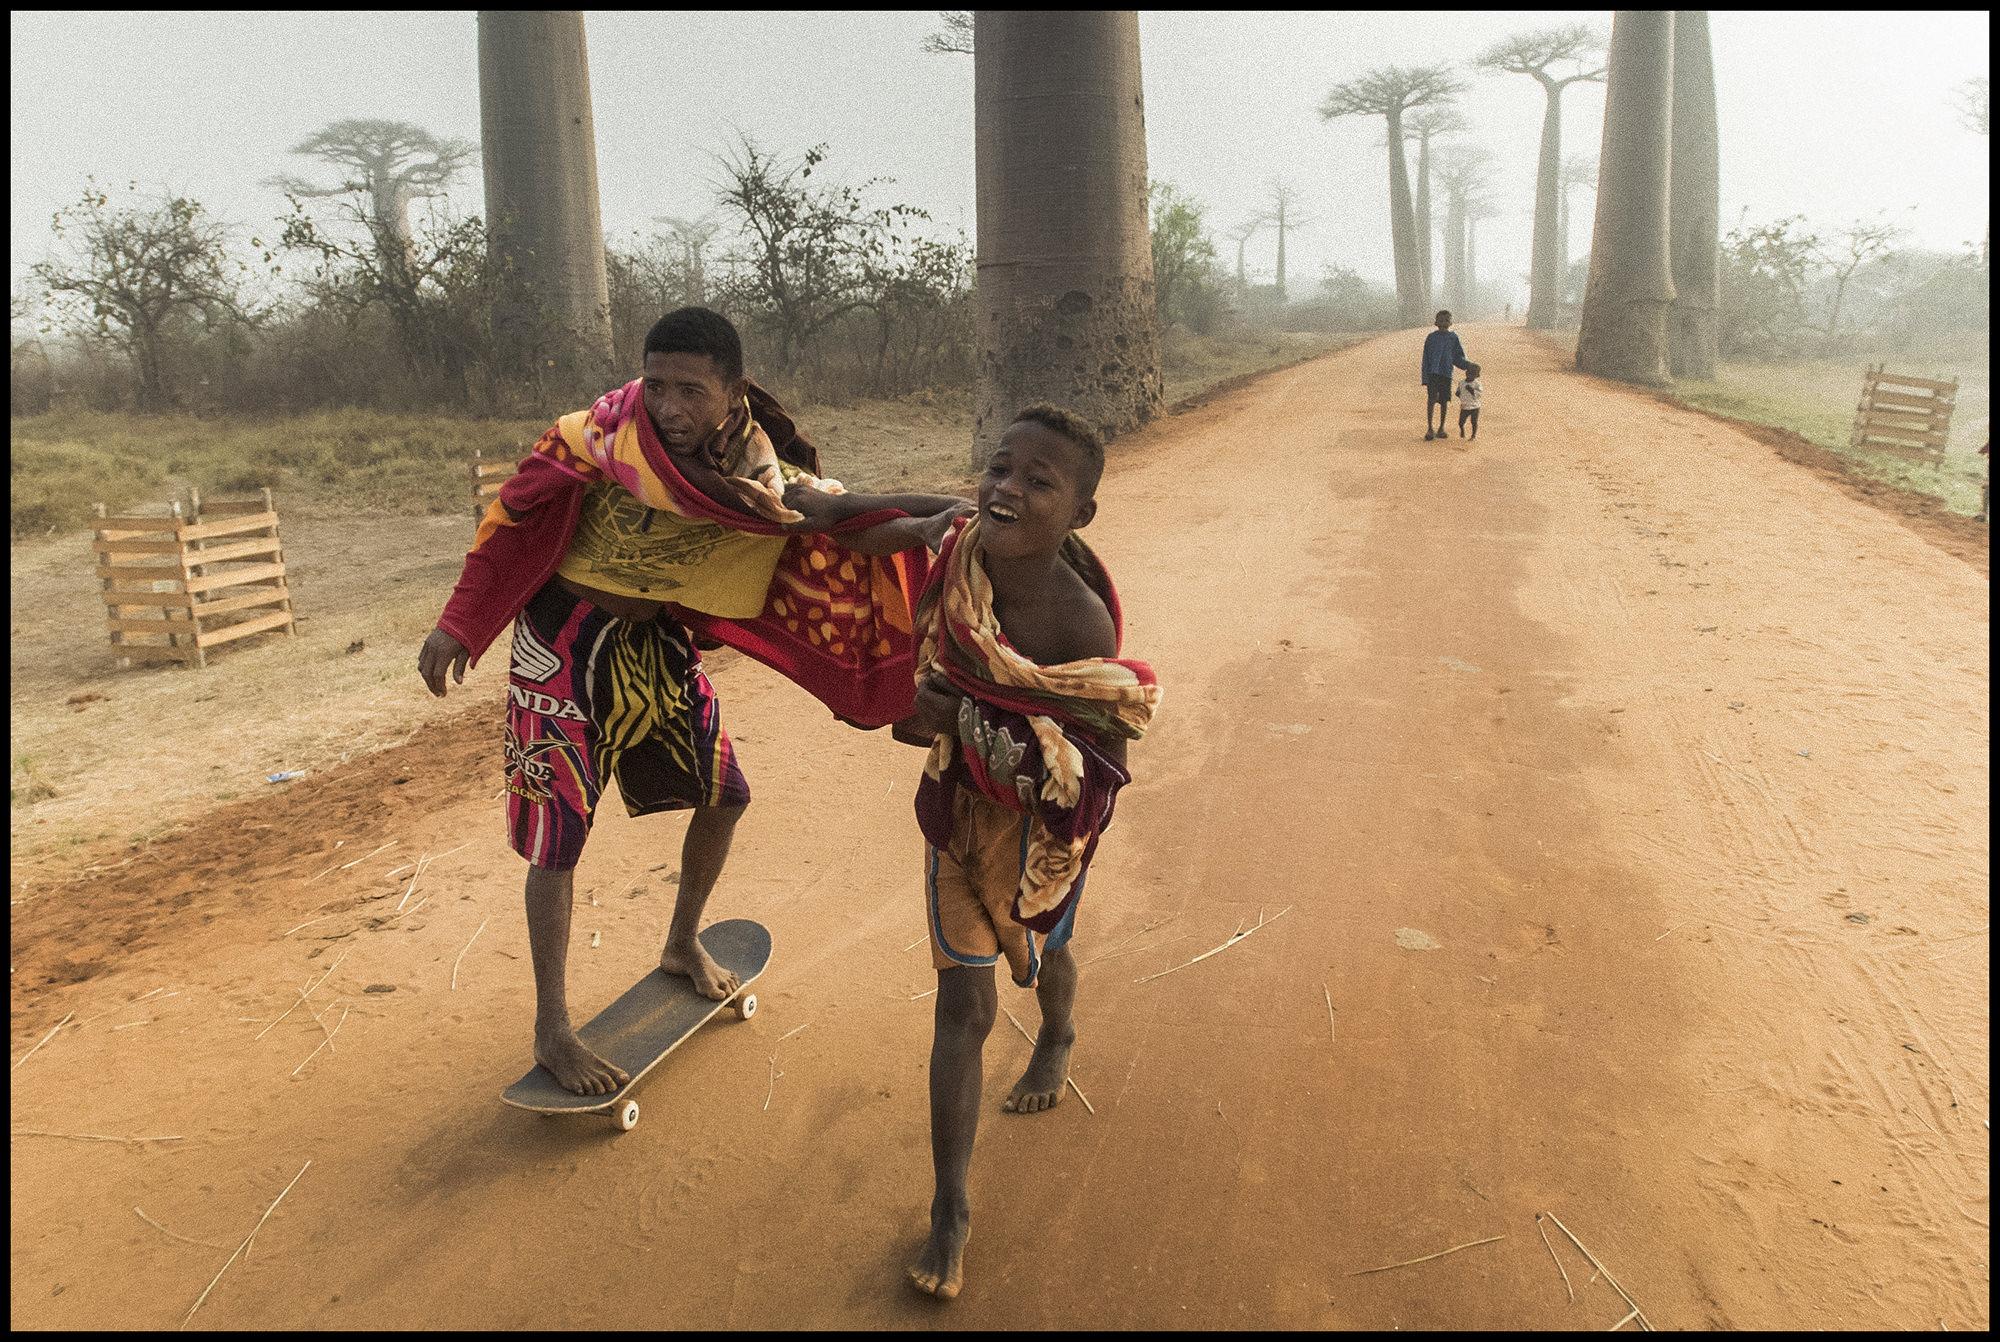 Digital Patrik Wallner Baobab Ethnic Pushing LOWQ 2000P